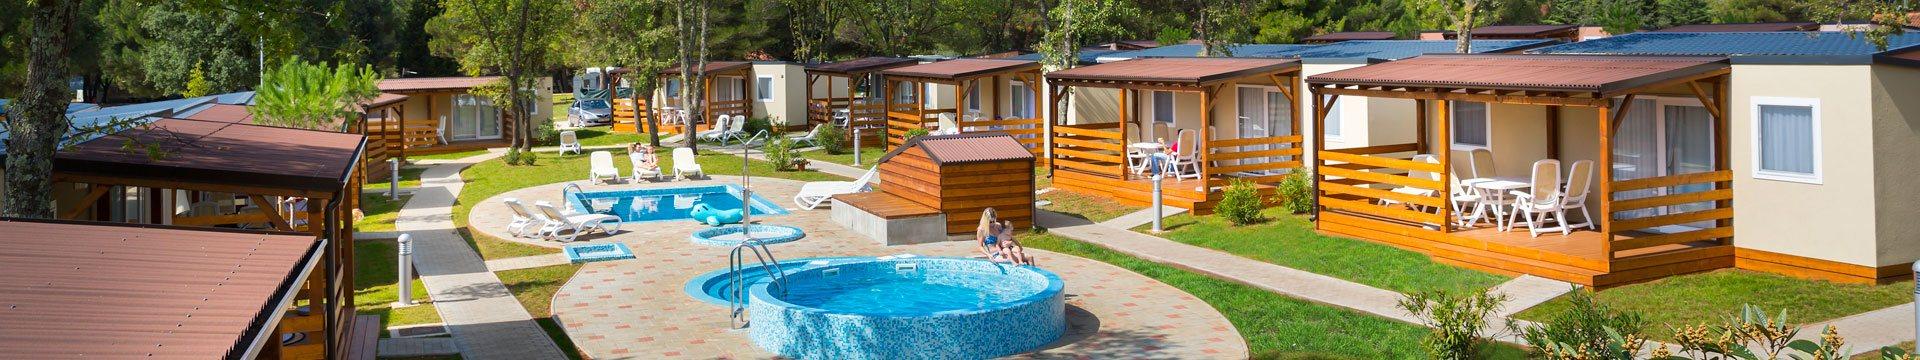 Case mobili a Orsera | AdriaCamps